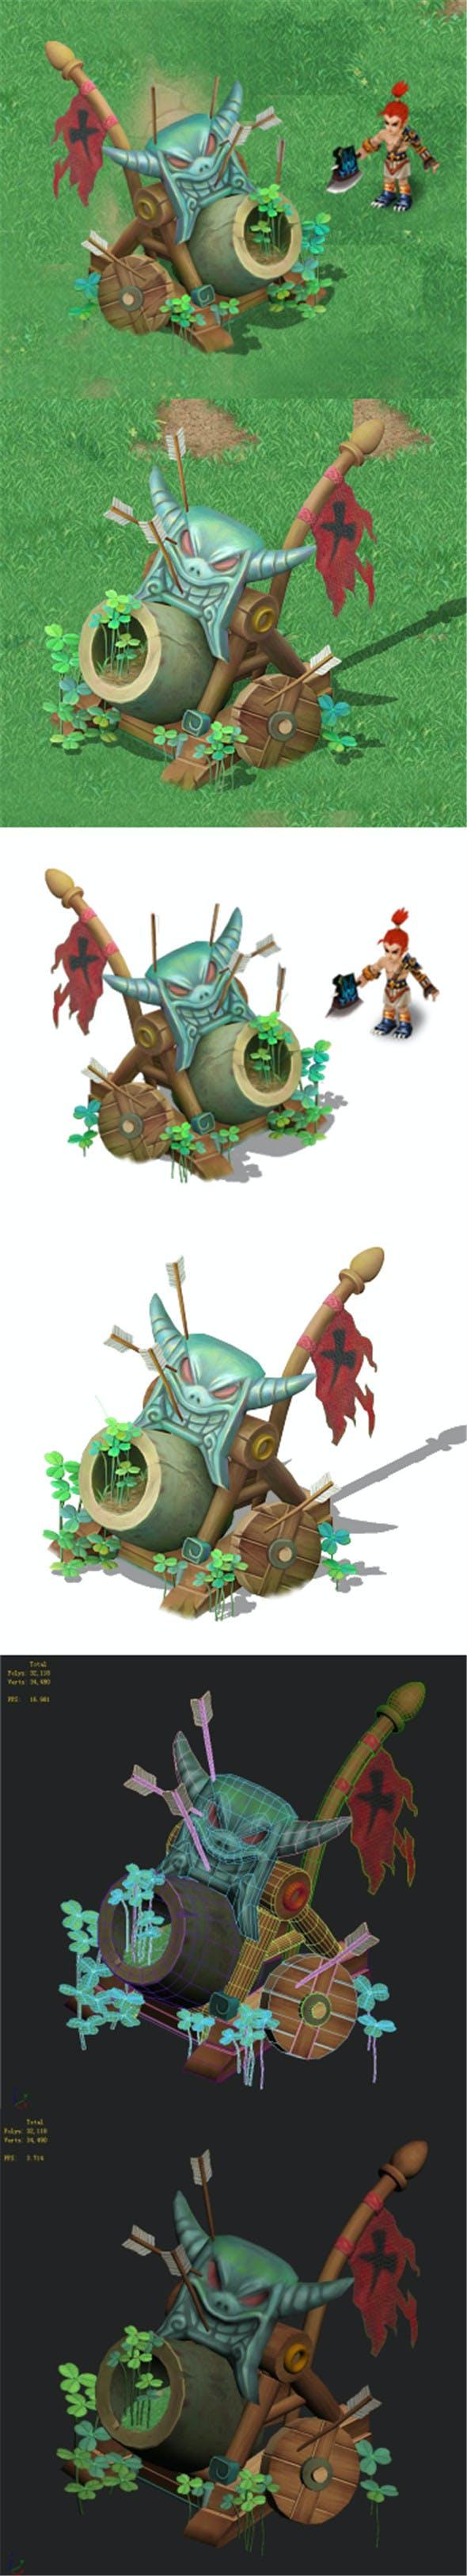 Cartoon version - Wind magic cannon - 3DOcean Item for Sale